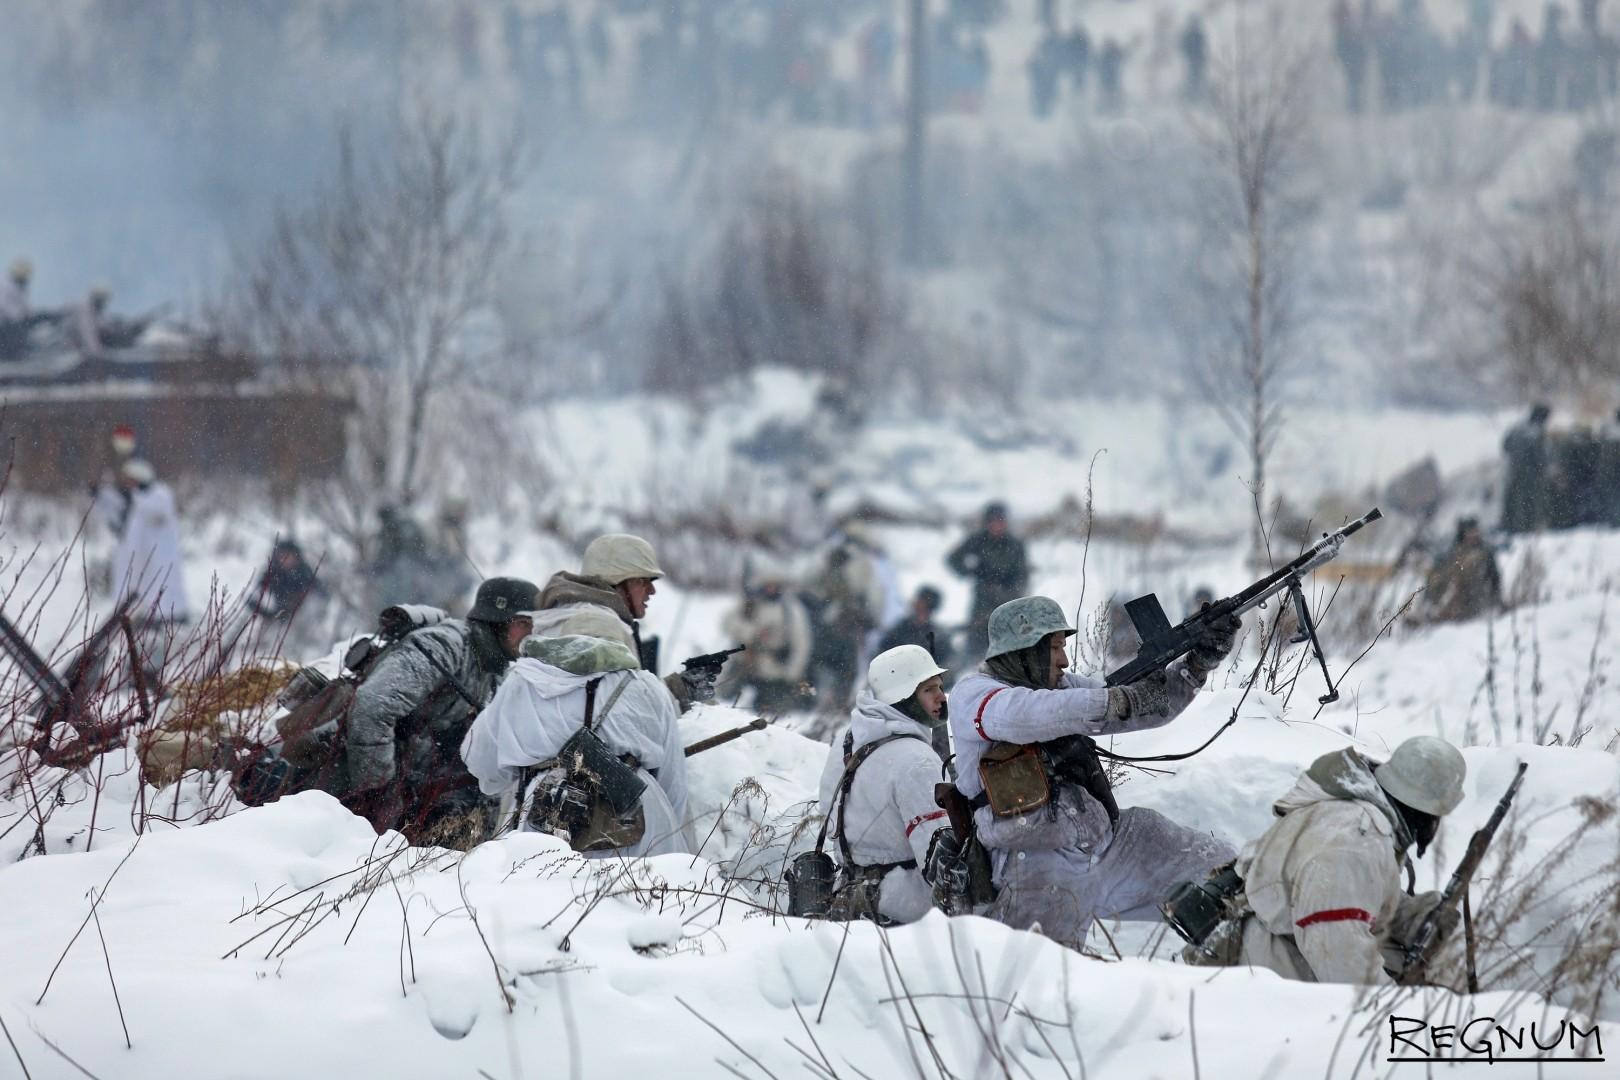 Контратака немецких солдат